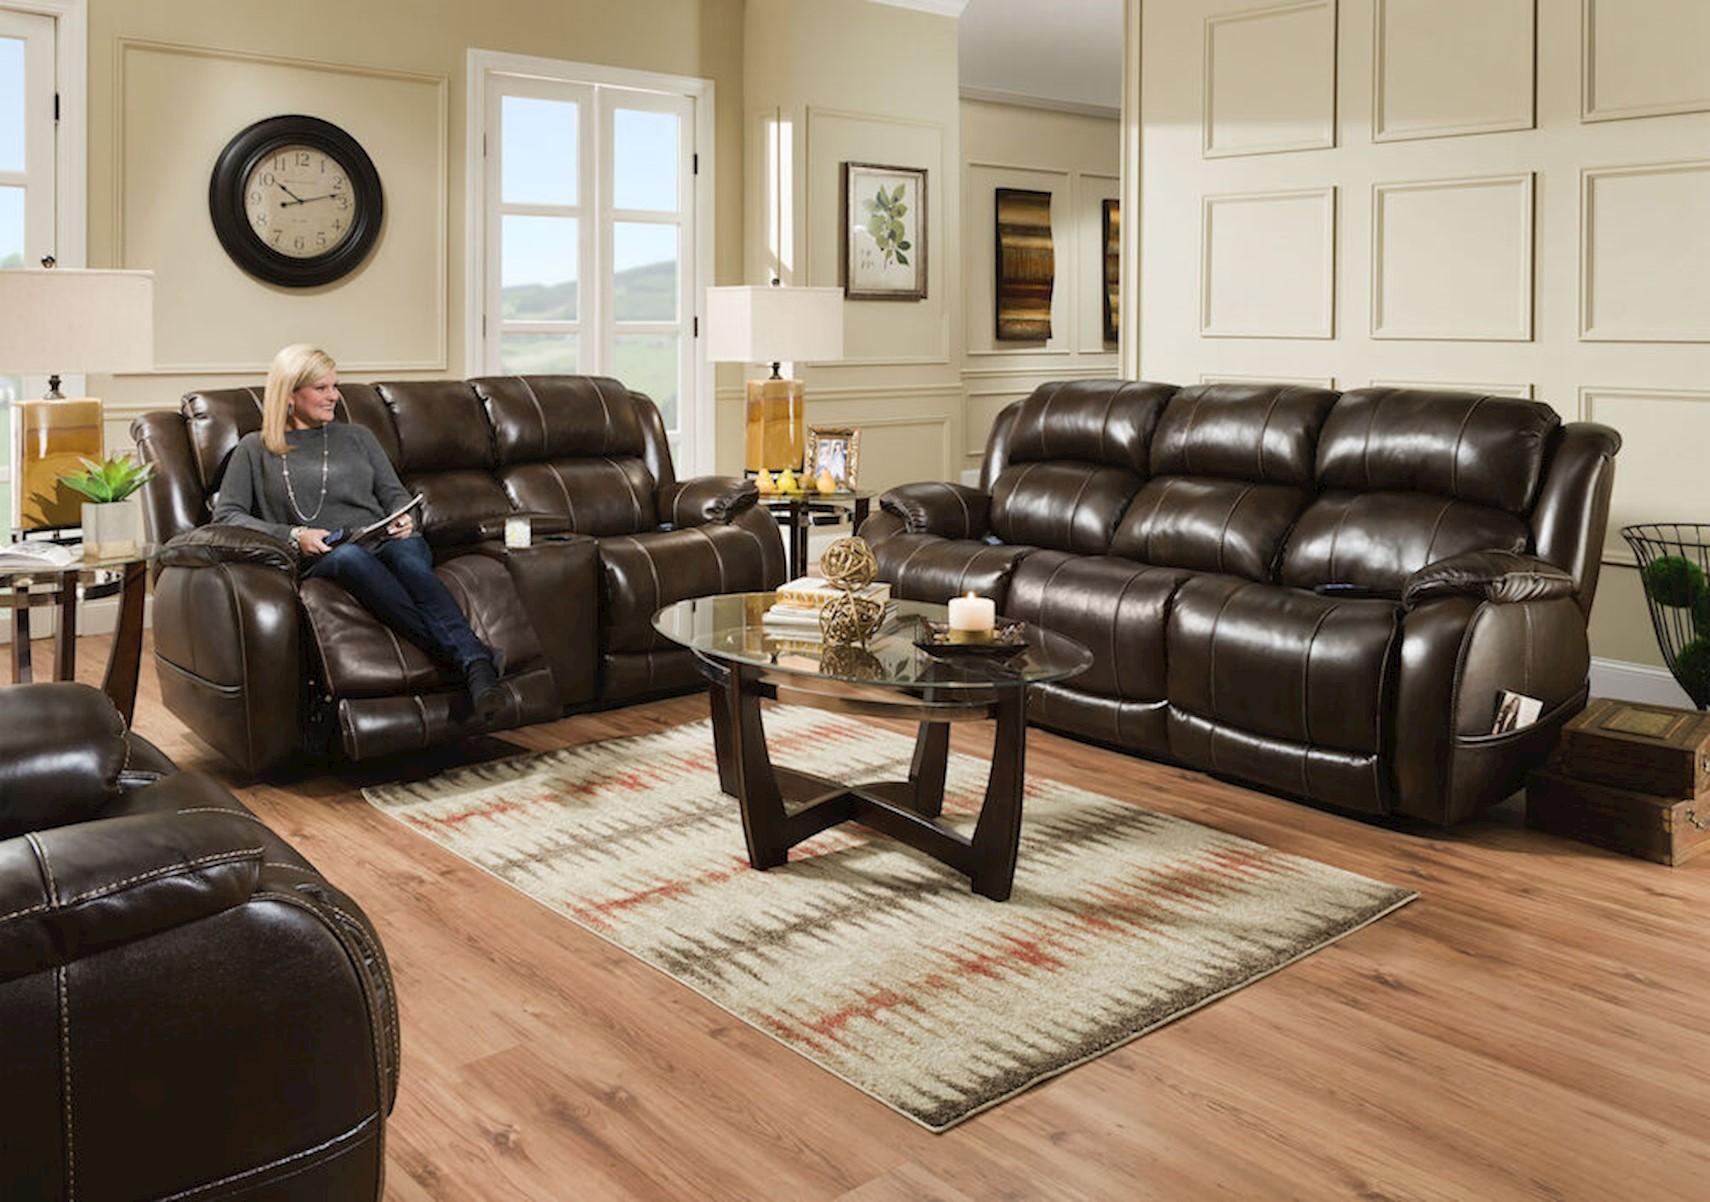 Admirable Lacks Palmer 2 Pc Power Reclining Living Room Set Ibusinesslaw Wood Chair Design Ideas Ibusinesslaworg